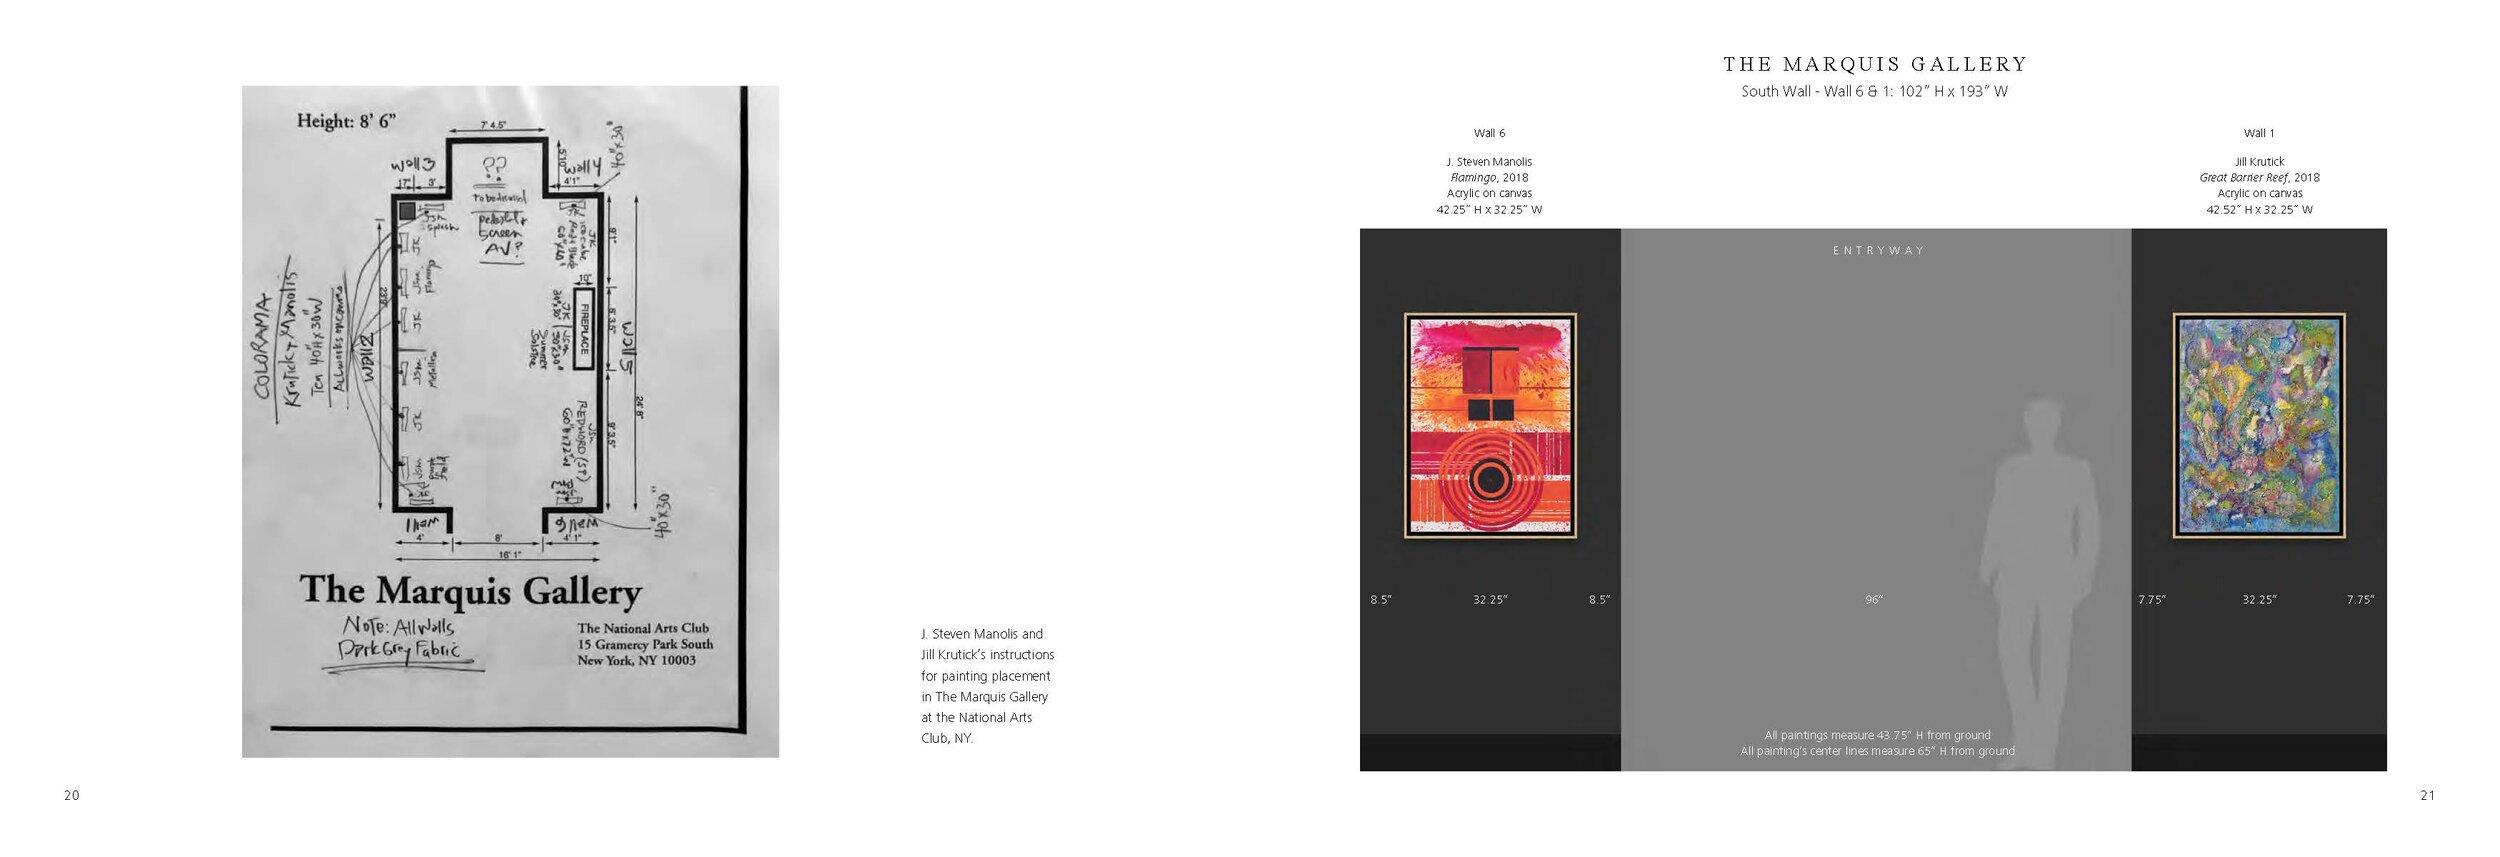 09-05-2018-Manolis-NationalArtsClub-FINAL web_Page_12.jpg